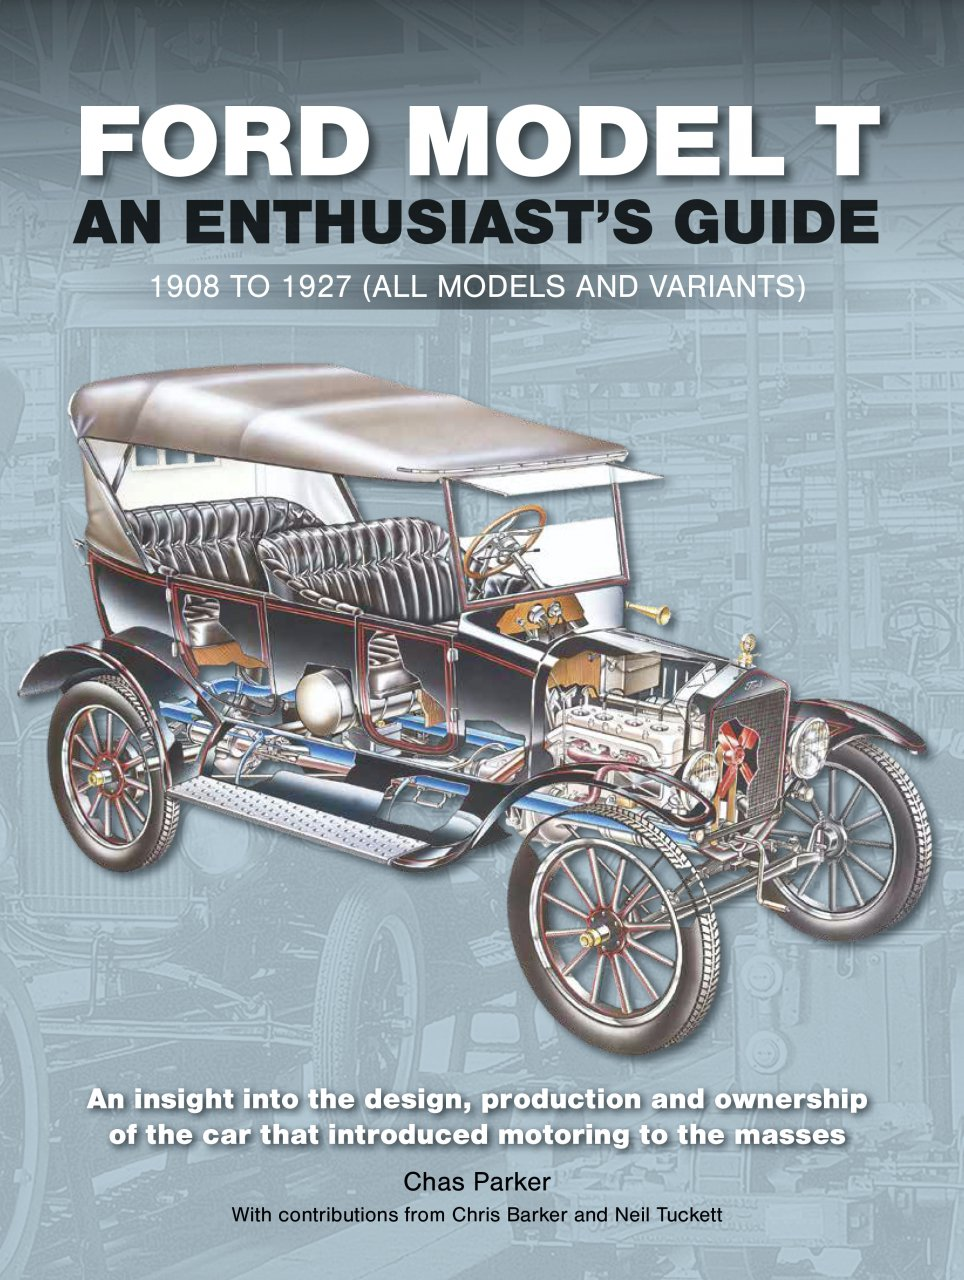 Automobile, Bookshelf: A British perspective on a historic American automobile, ClassicCars.com Journal